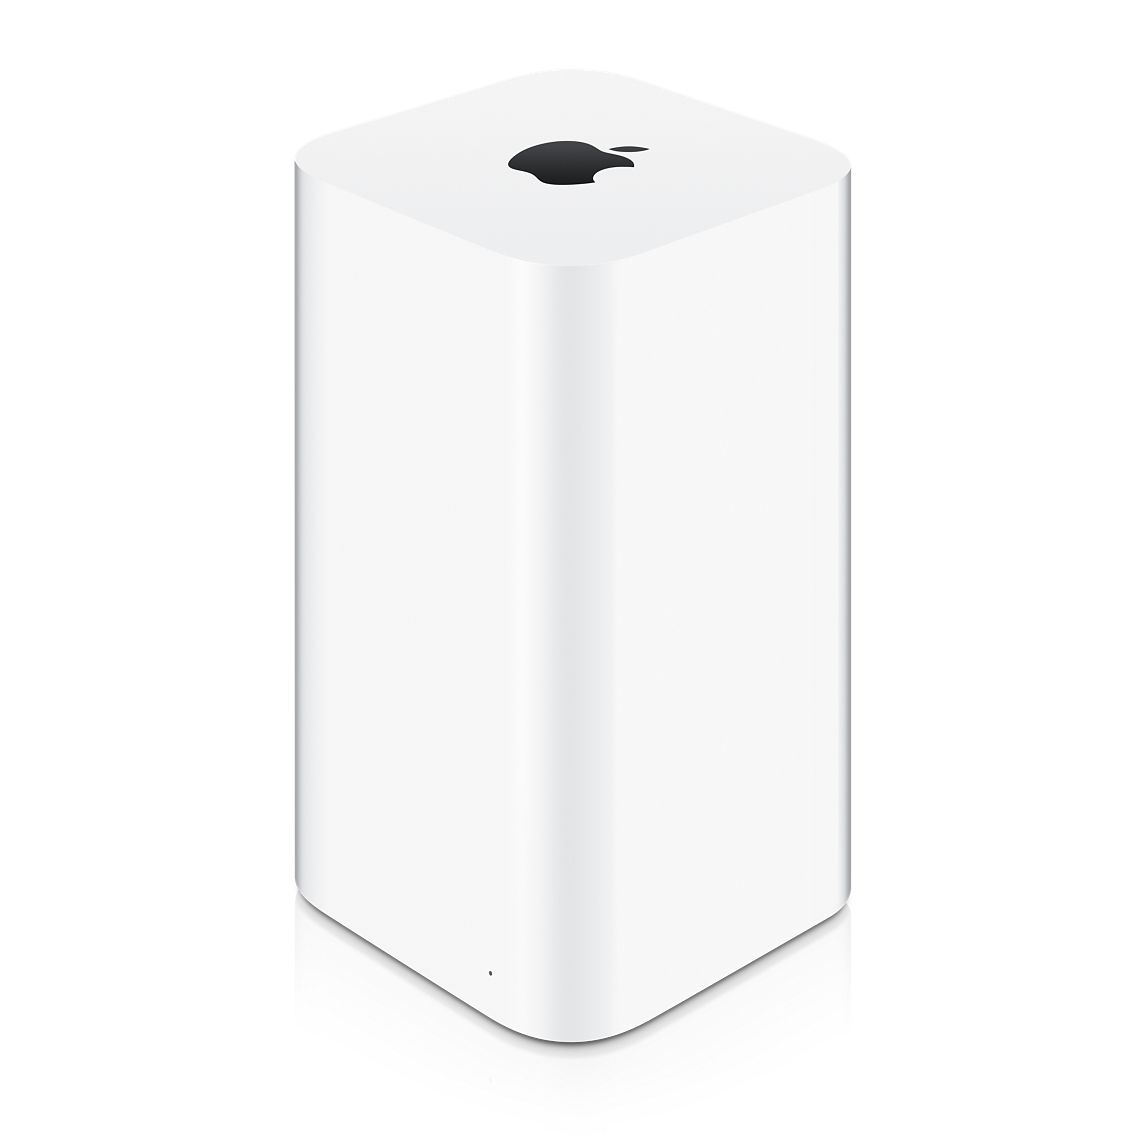 Airport Time Capsule - Bridge Mode/Setup? - Apple Community